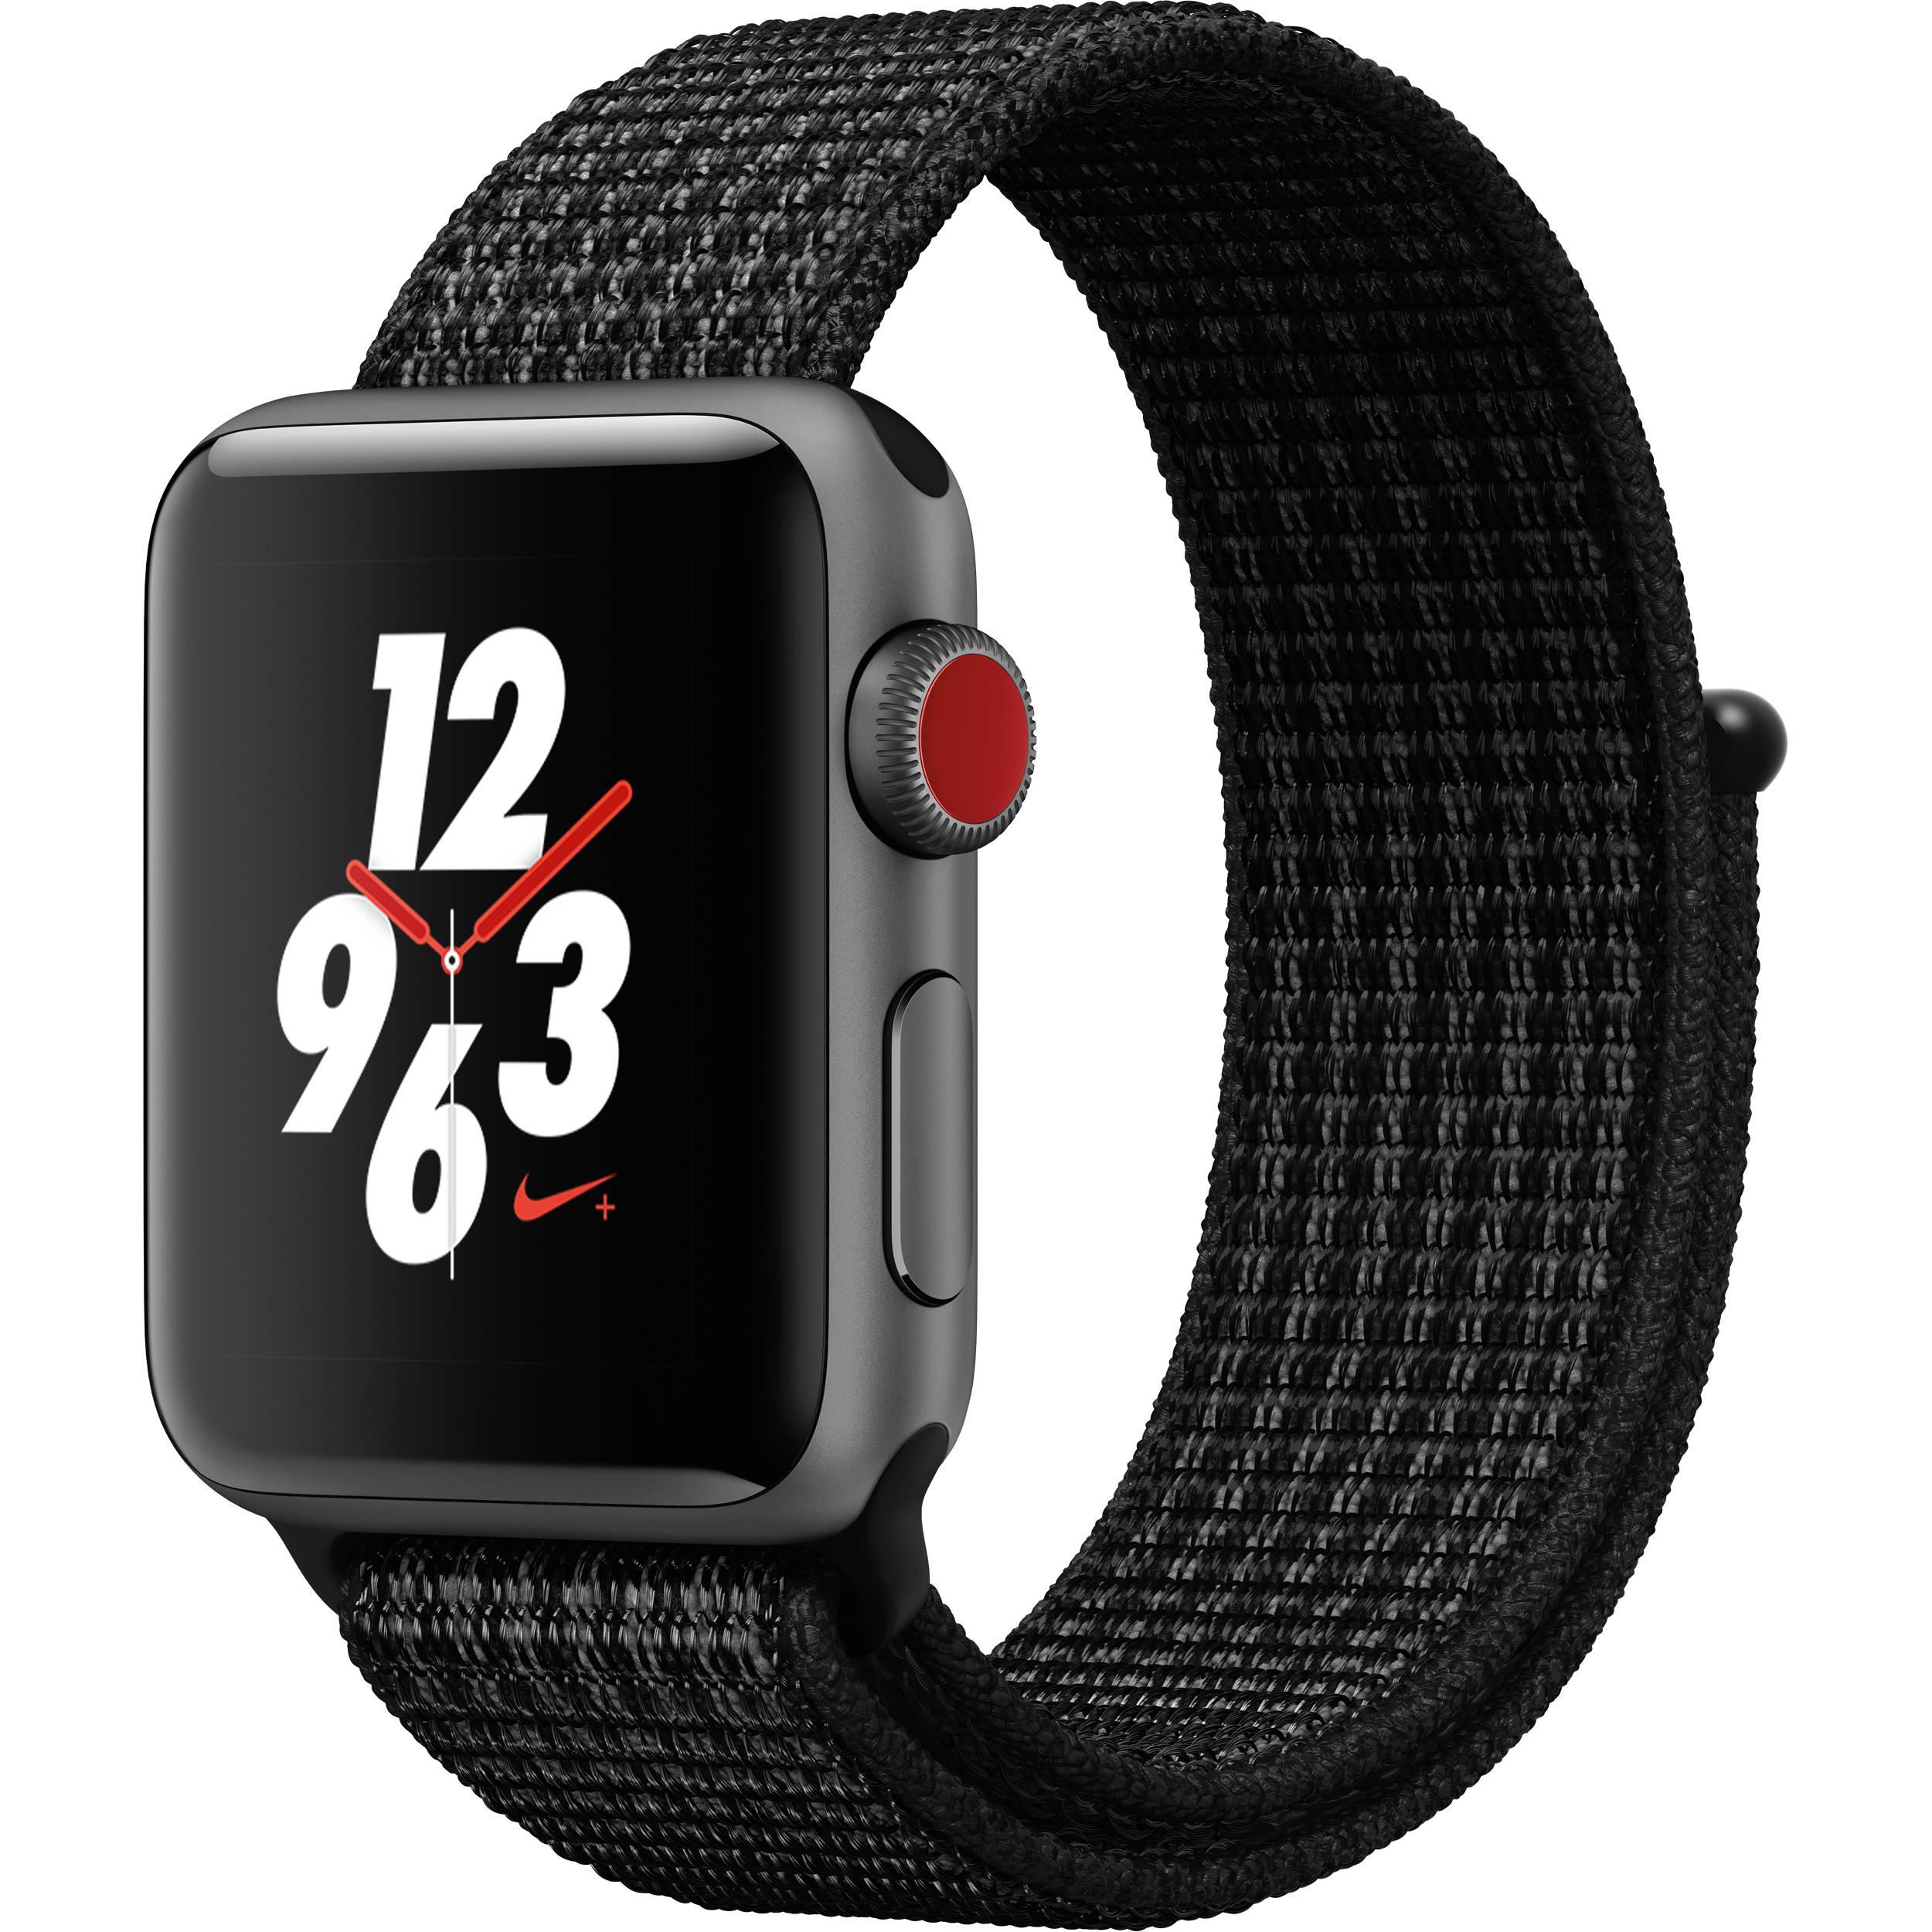 Apple Watch Nike+ Series 3 38mm Smartwatch (GPS + Cellular, Space Gray  Aluminum Case, Black/Pure Platinum Nike Sport Loop)